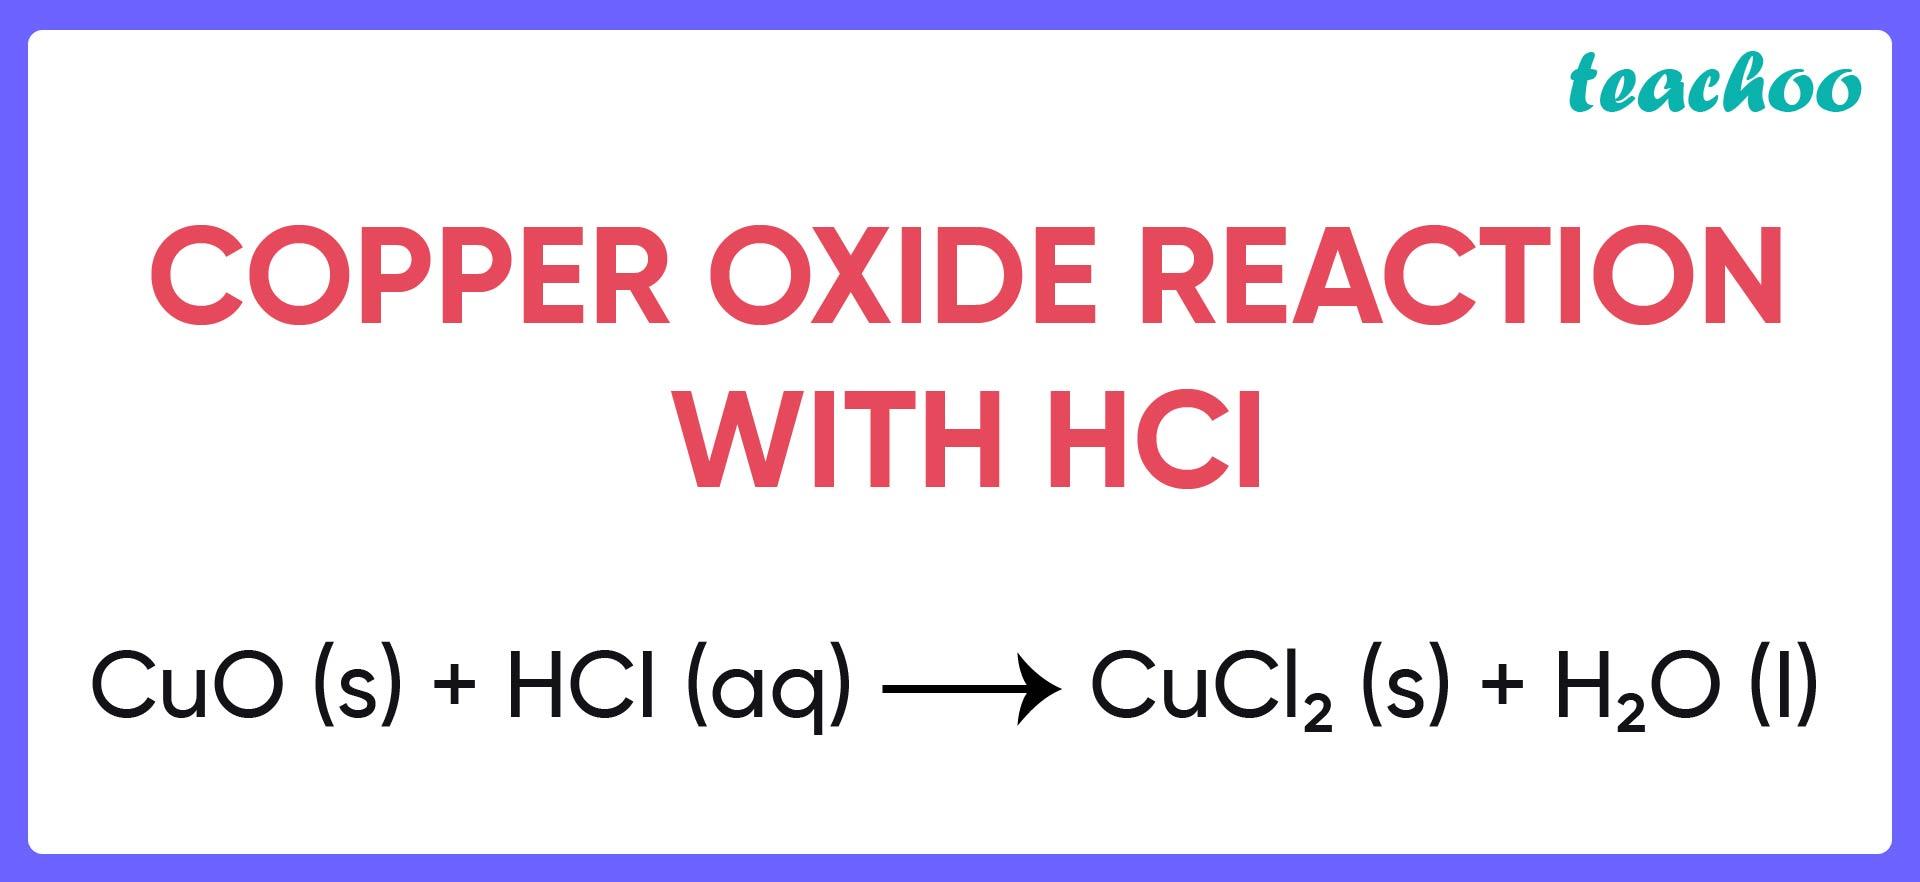 Copper Oxide reaction with HCl-Teachoo.jpg